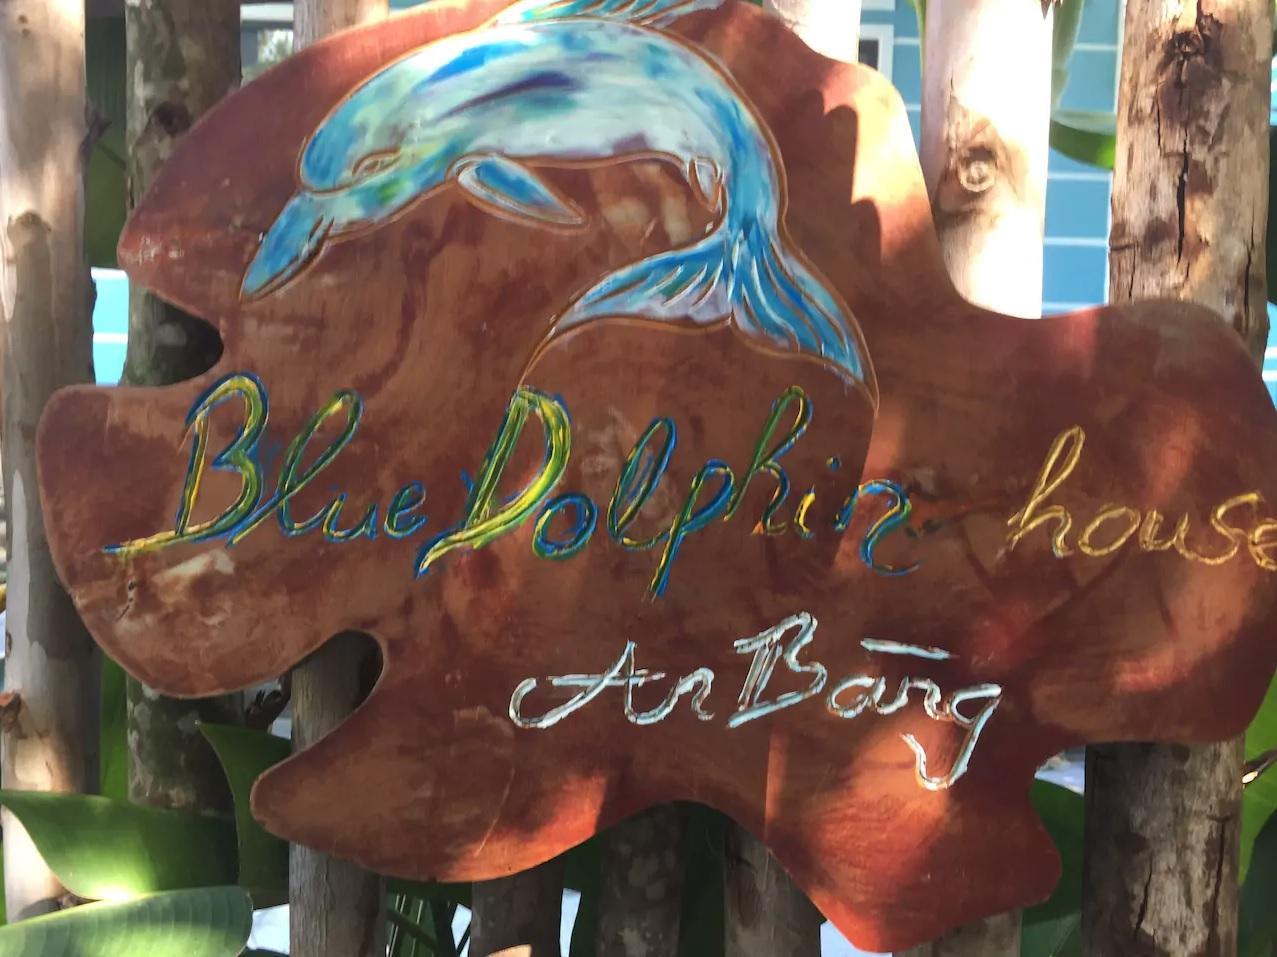 The Blue Dolphin House